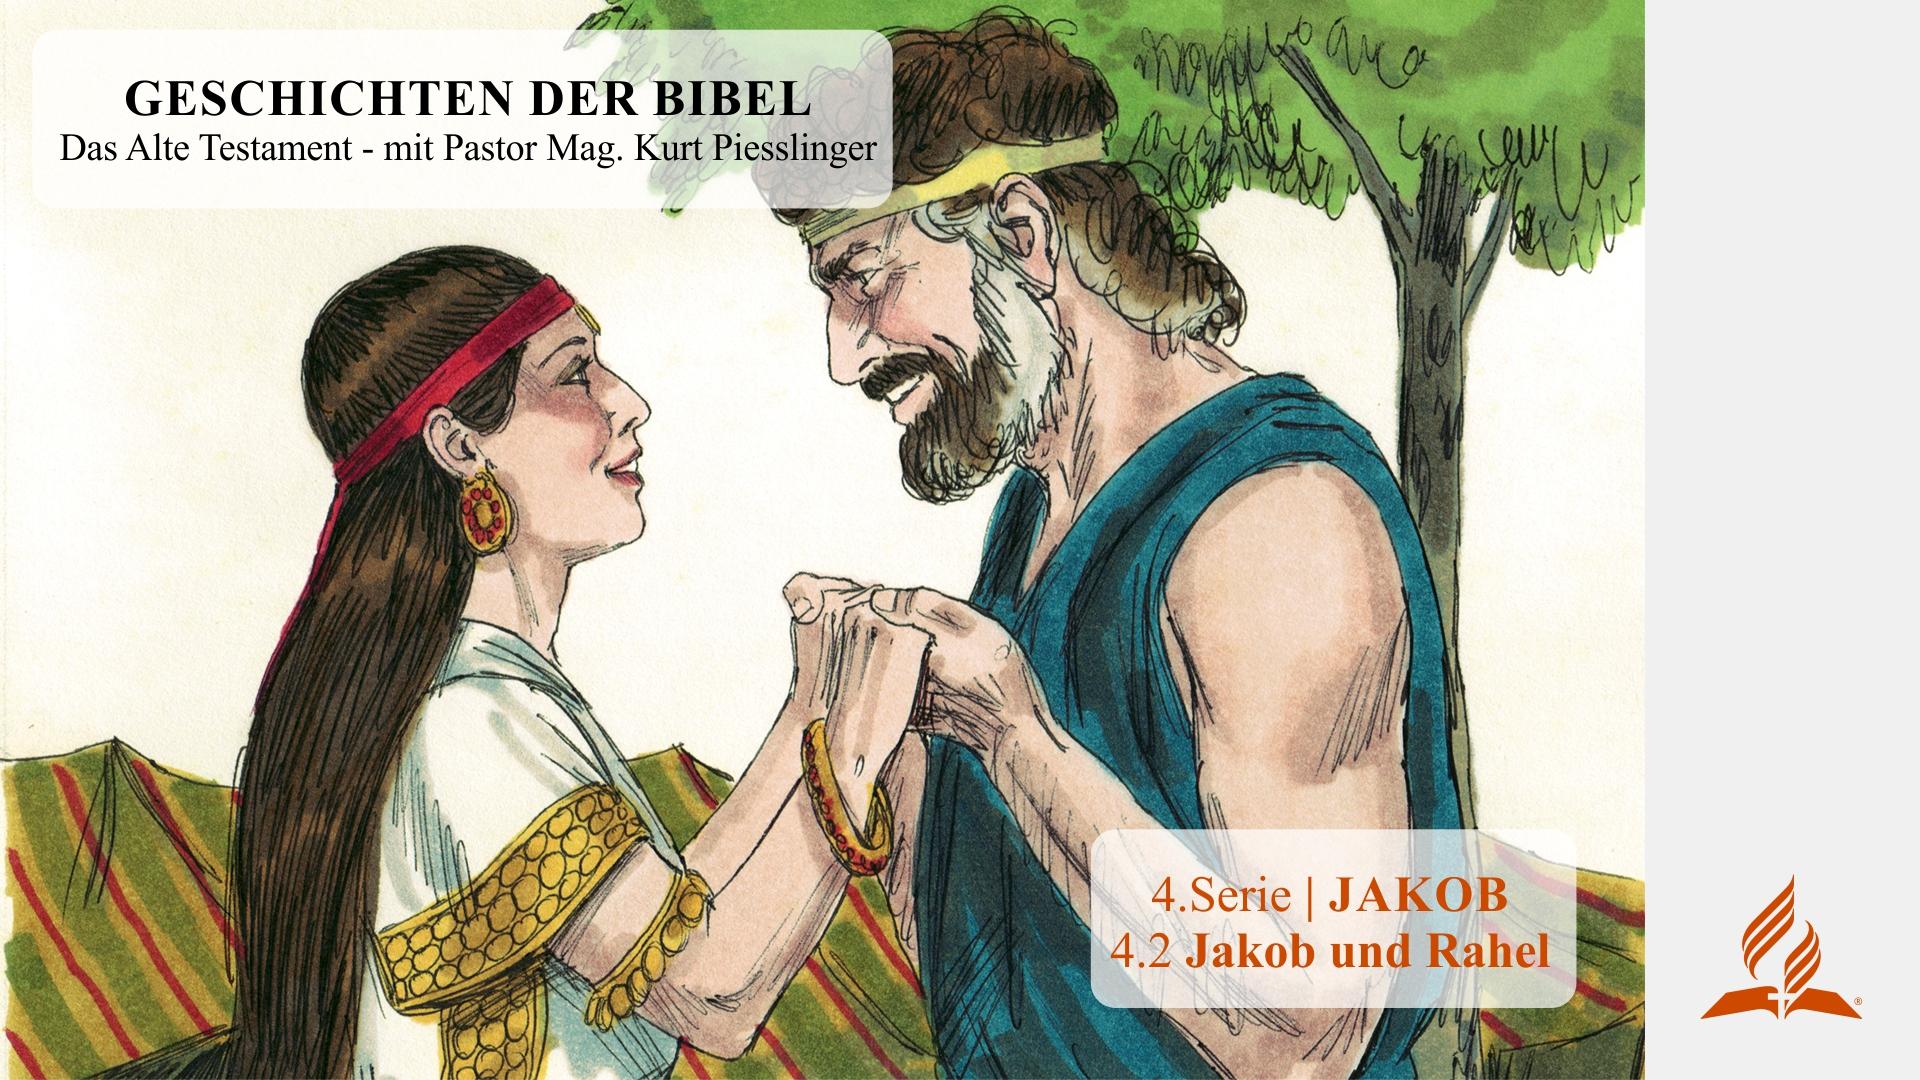 4.2 Jakob und Rahel x